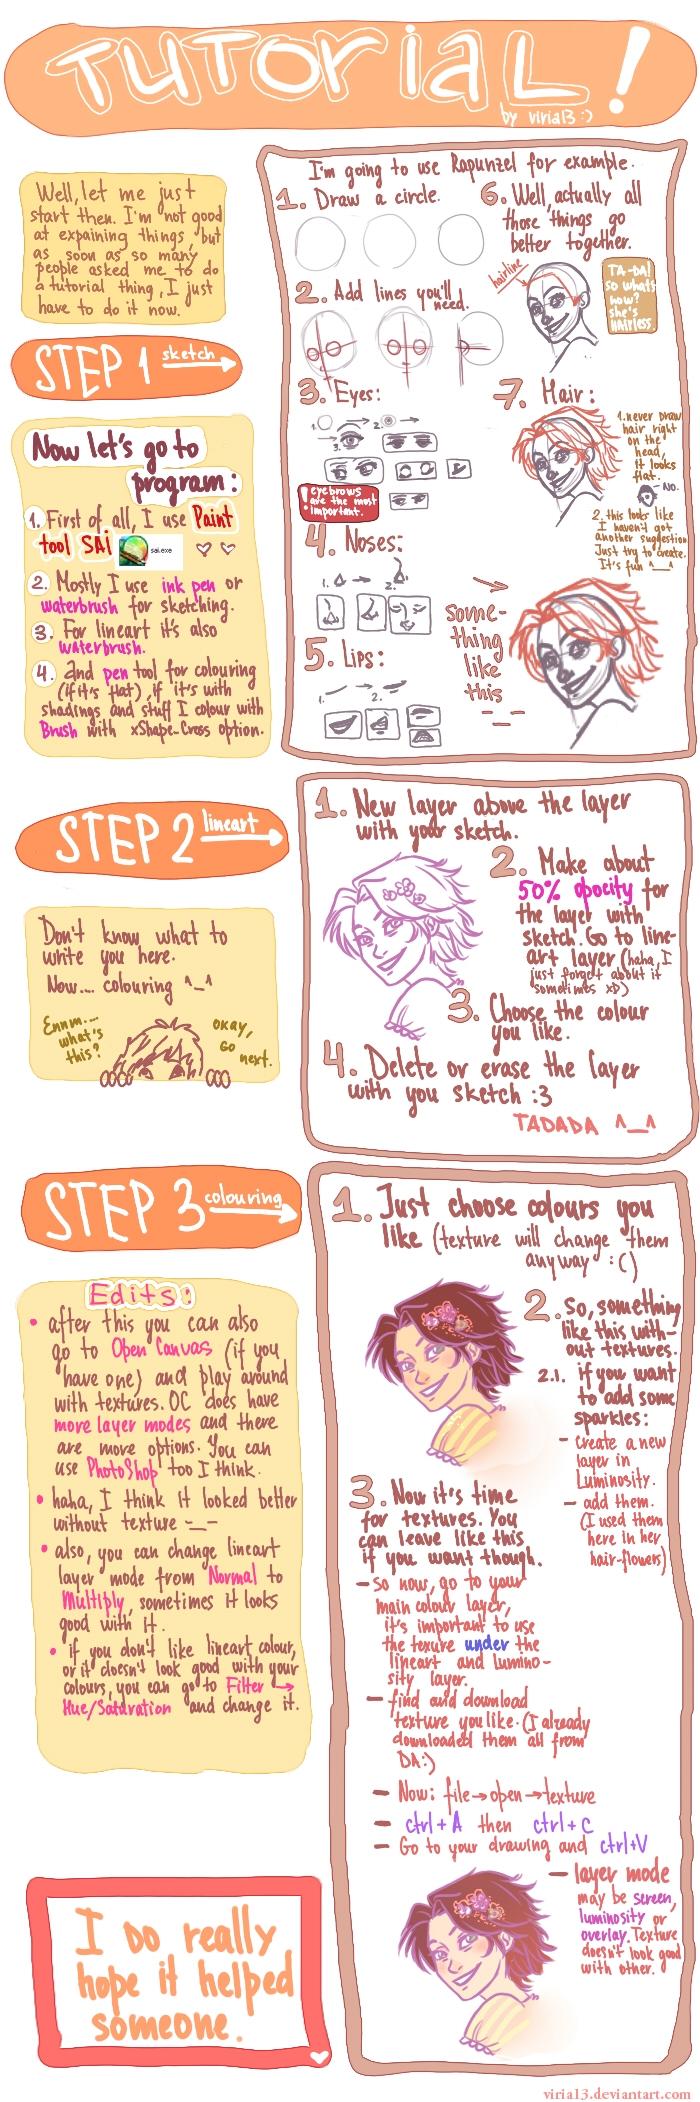 tutorial by viria13 on DeviantArt